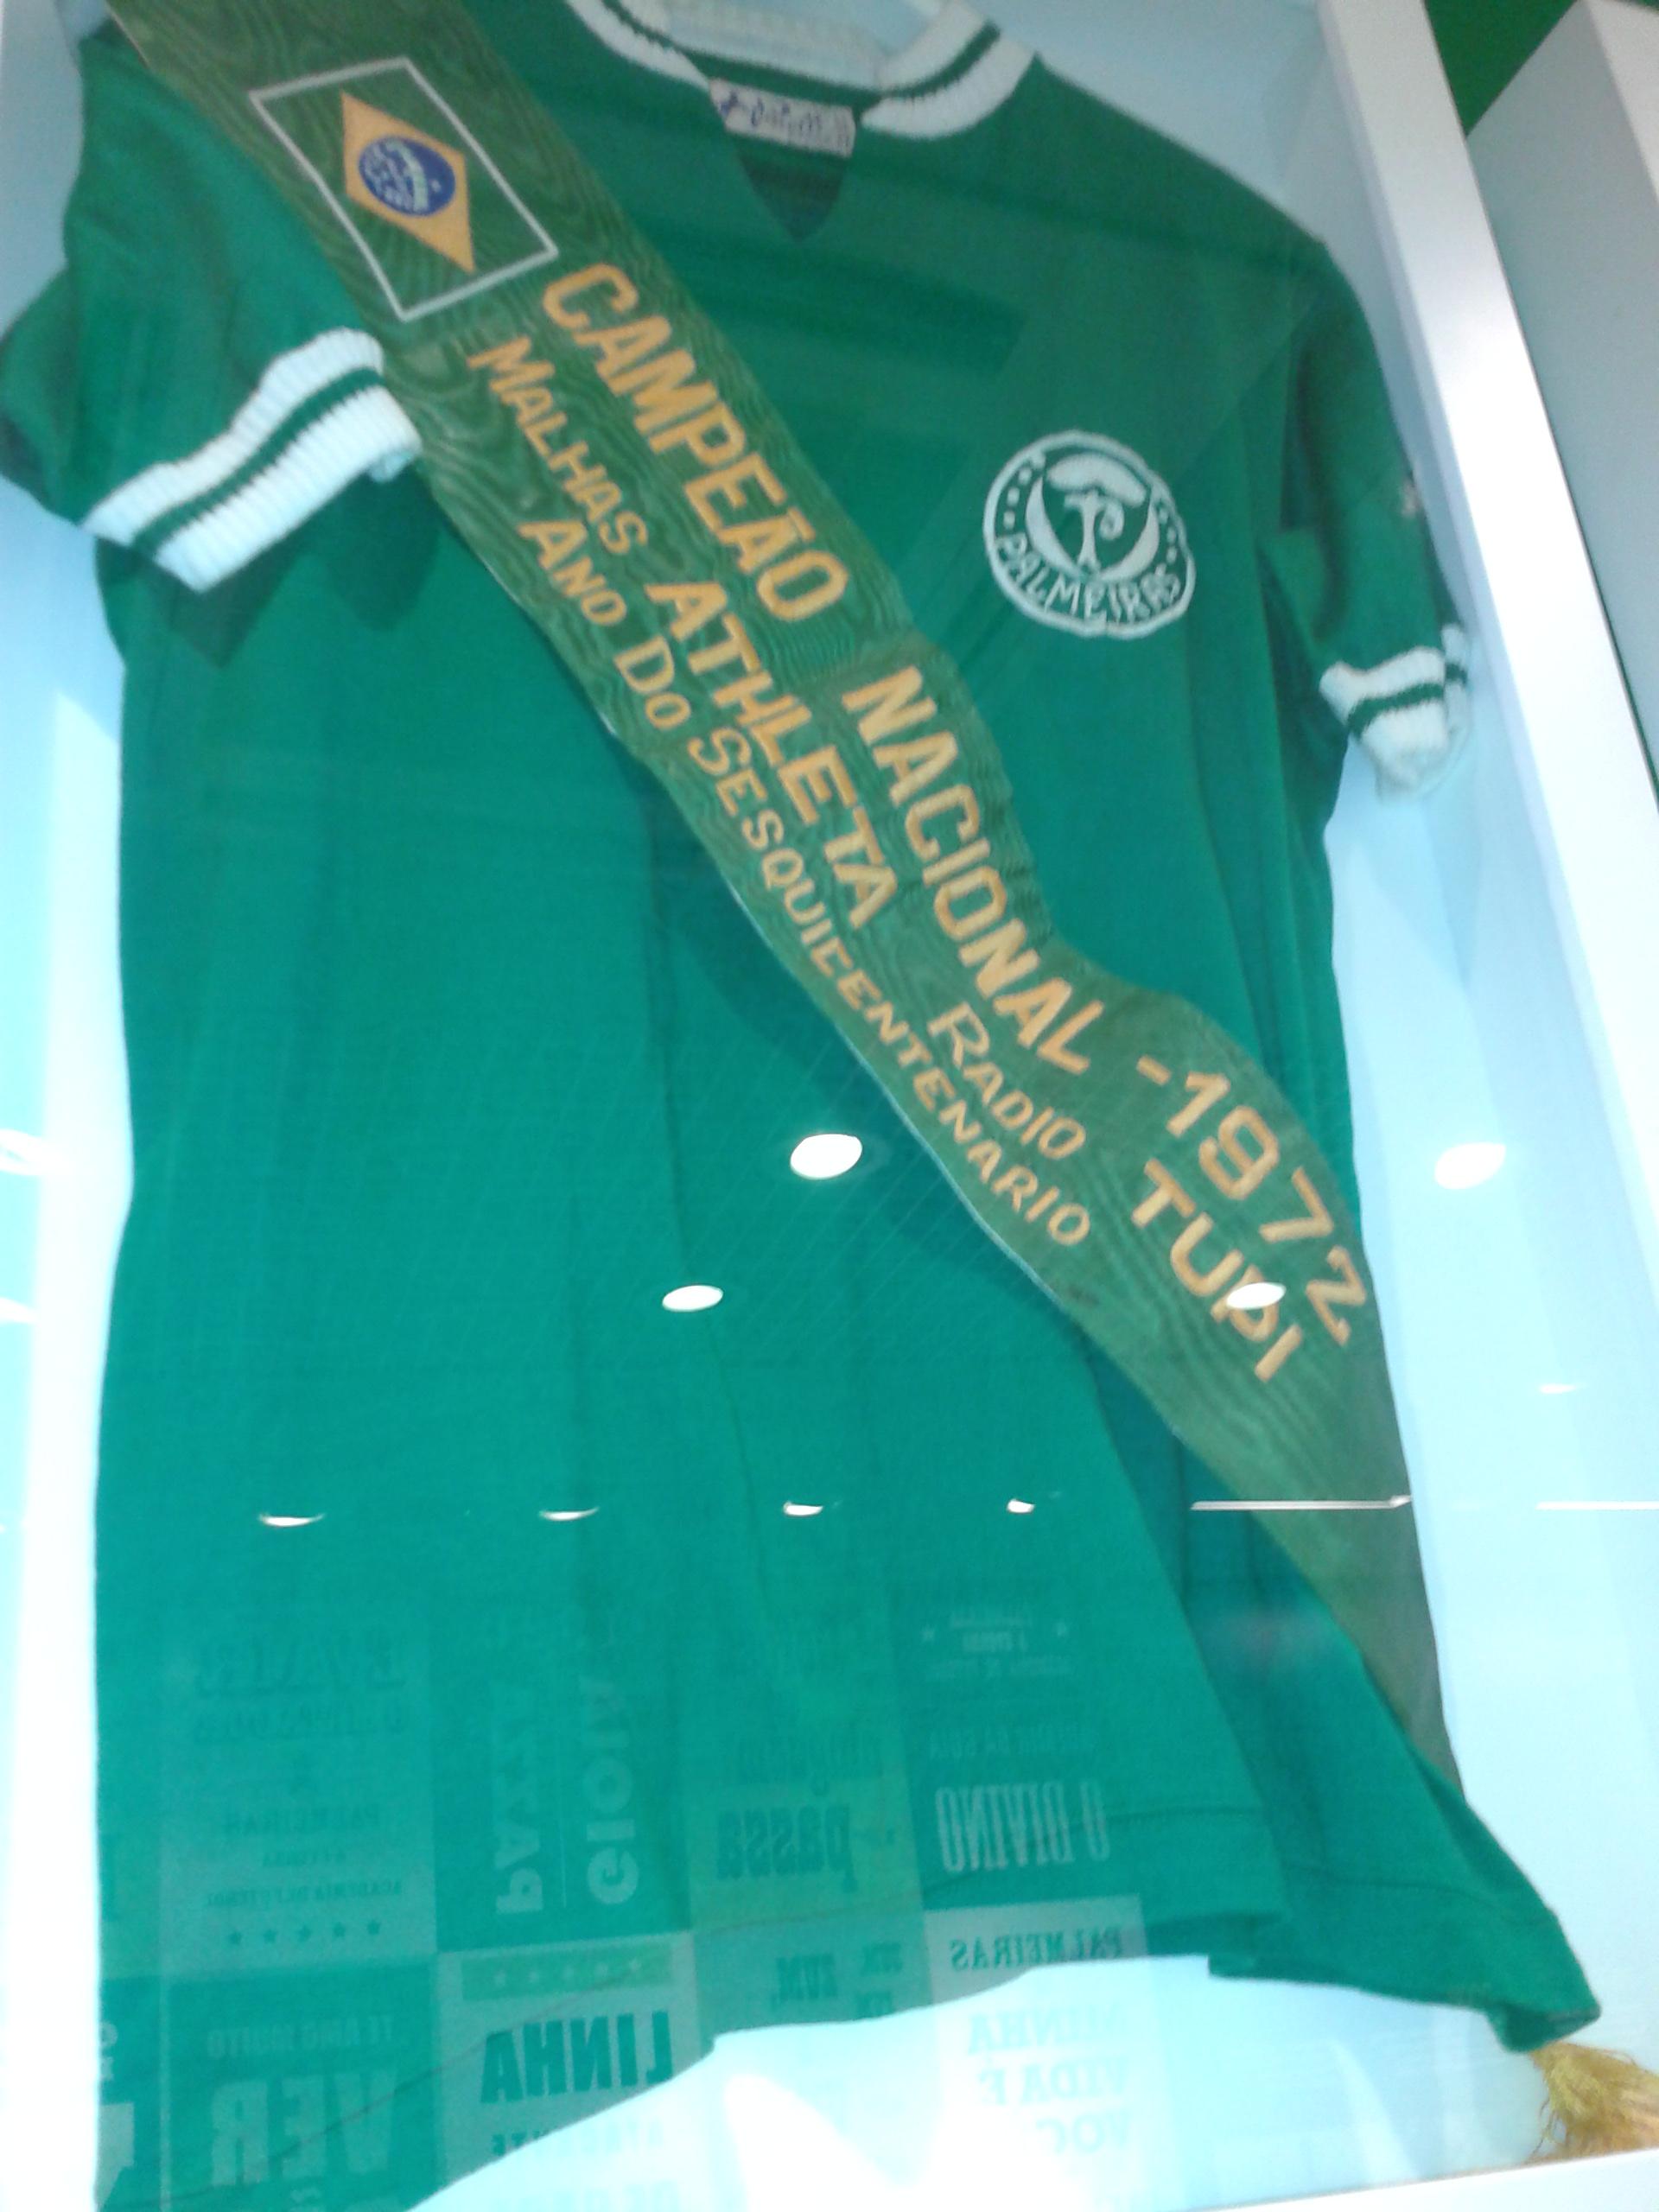 Rolê do Fut Pop Clube pela loja oficial do Palmeiras – Fut Pop Clube ddb8d26adb4fe